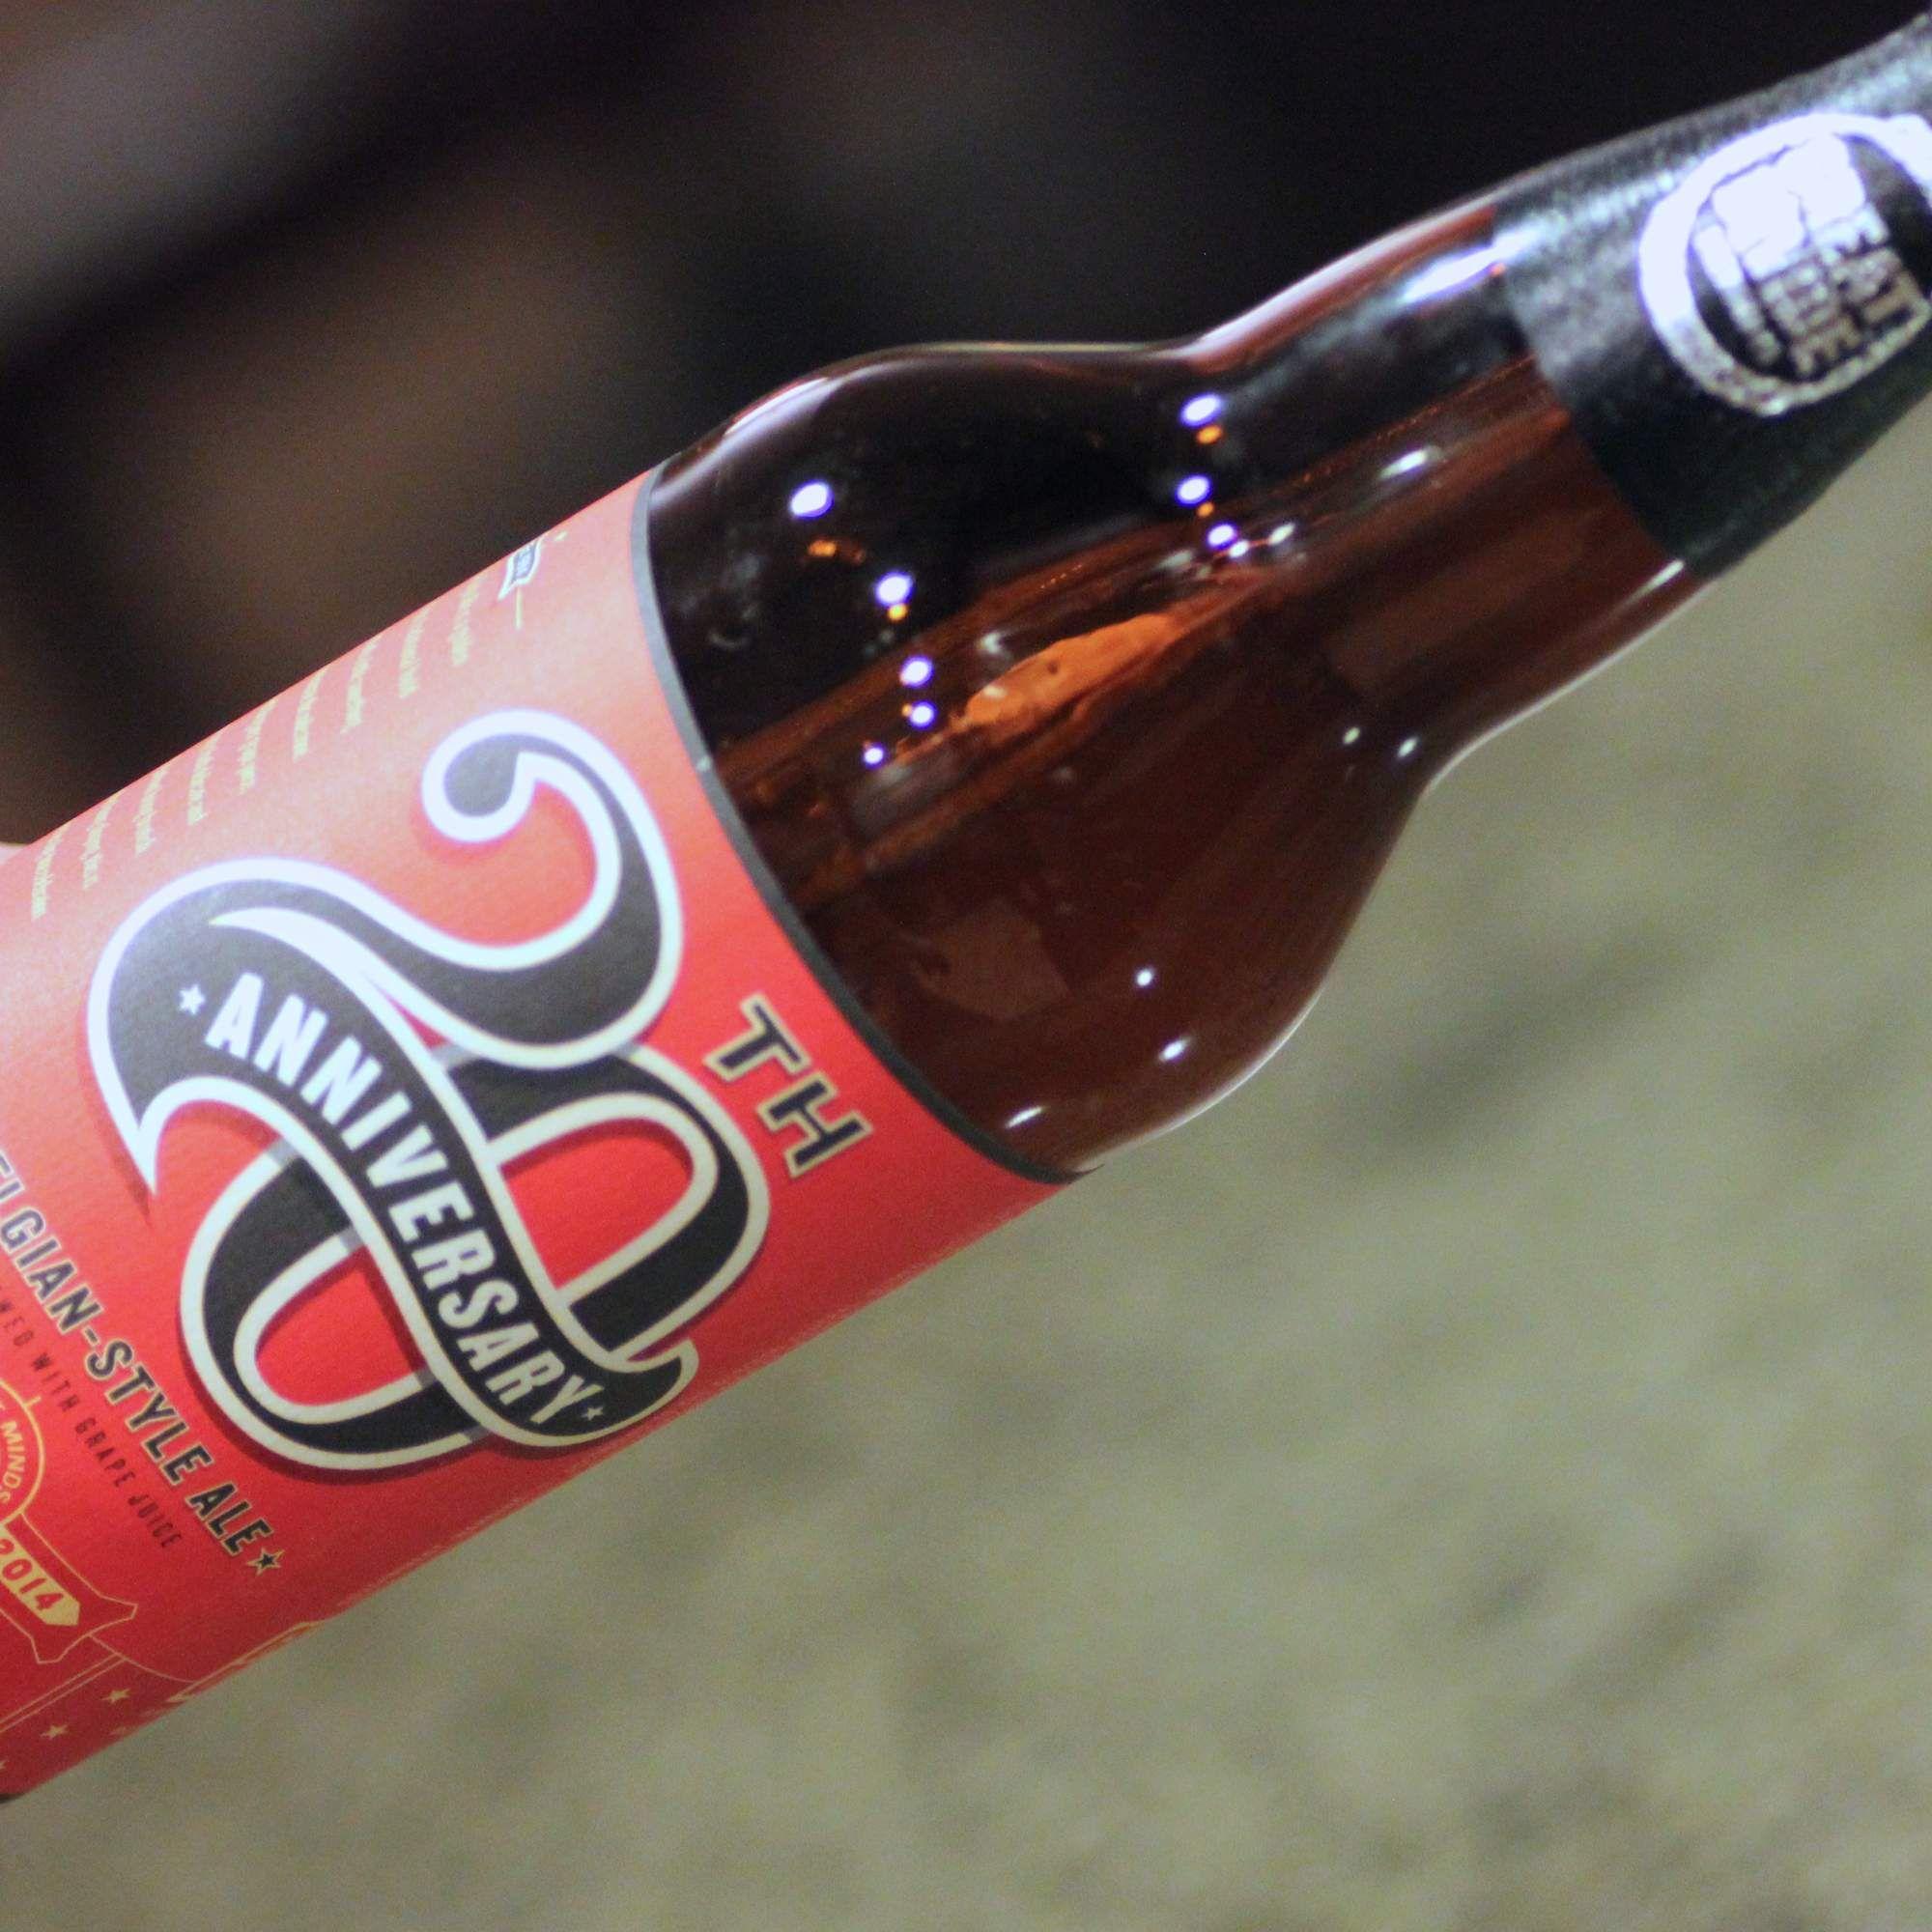 Grape Juice Is The Secret Ingredient In Great Divide S New Beer Wine And Beer Grape Juice Beer